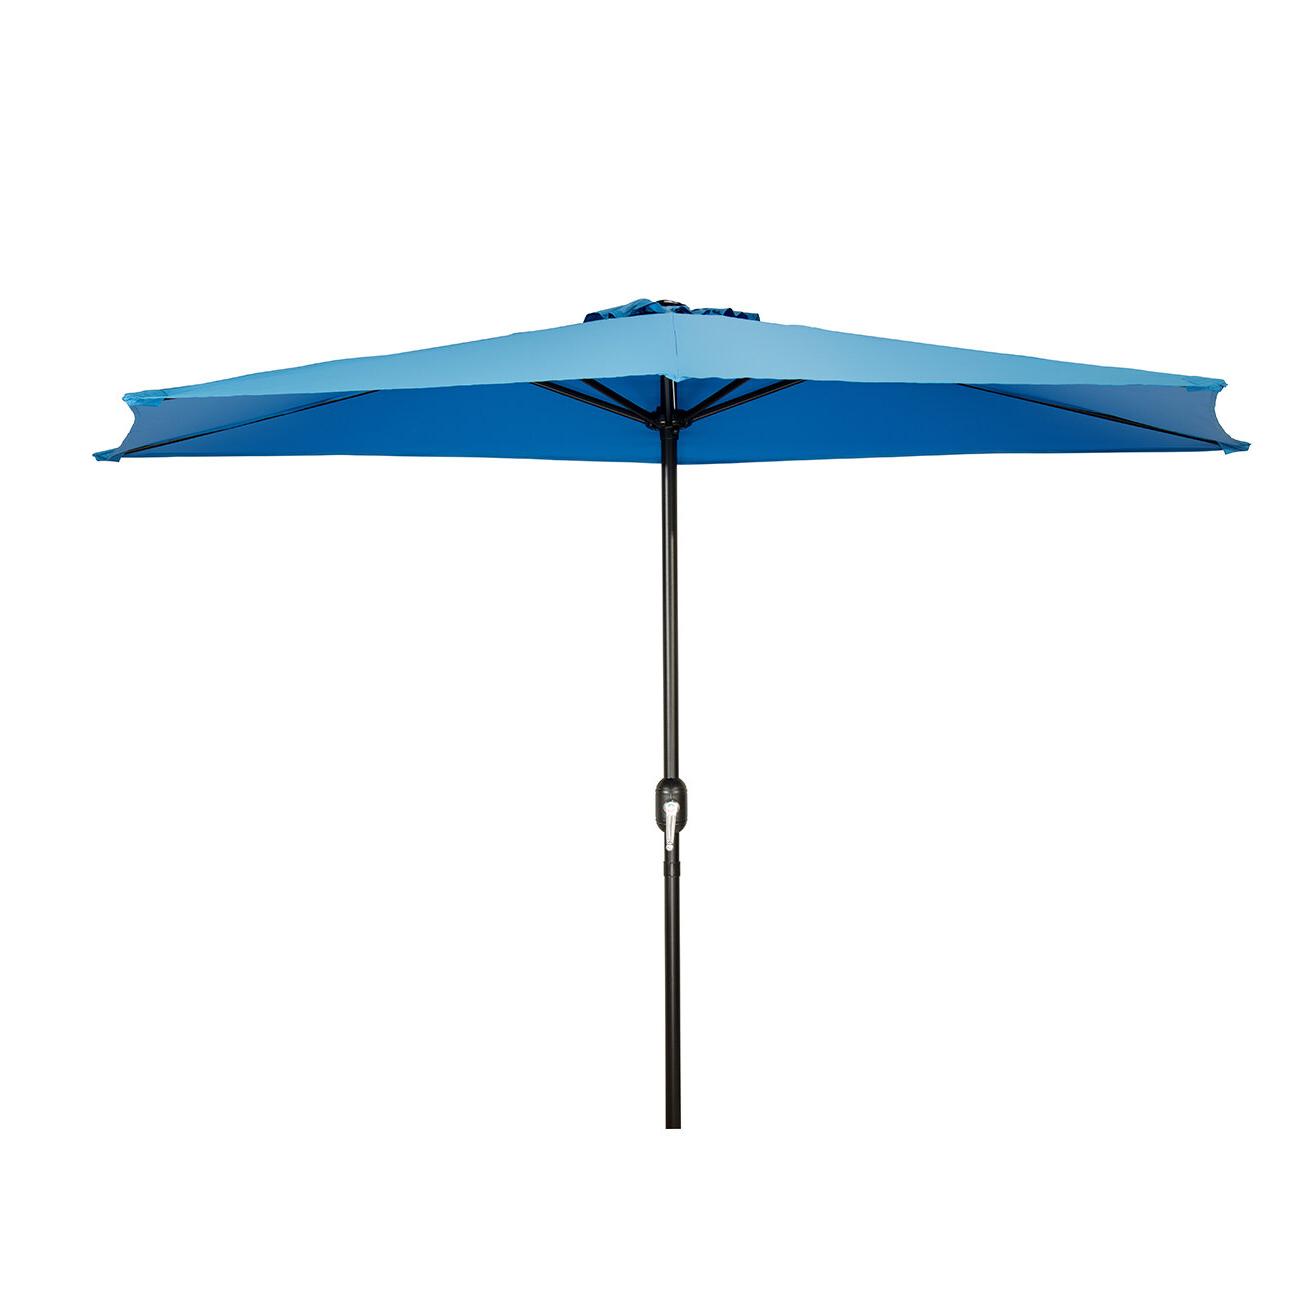 Widely Used Julewitz Patio Half 9' Market Umbrella Regarding Lonoke Patio Rectangular Market Umbrellas (View 10 of 20)